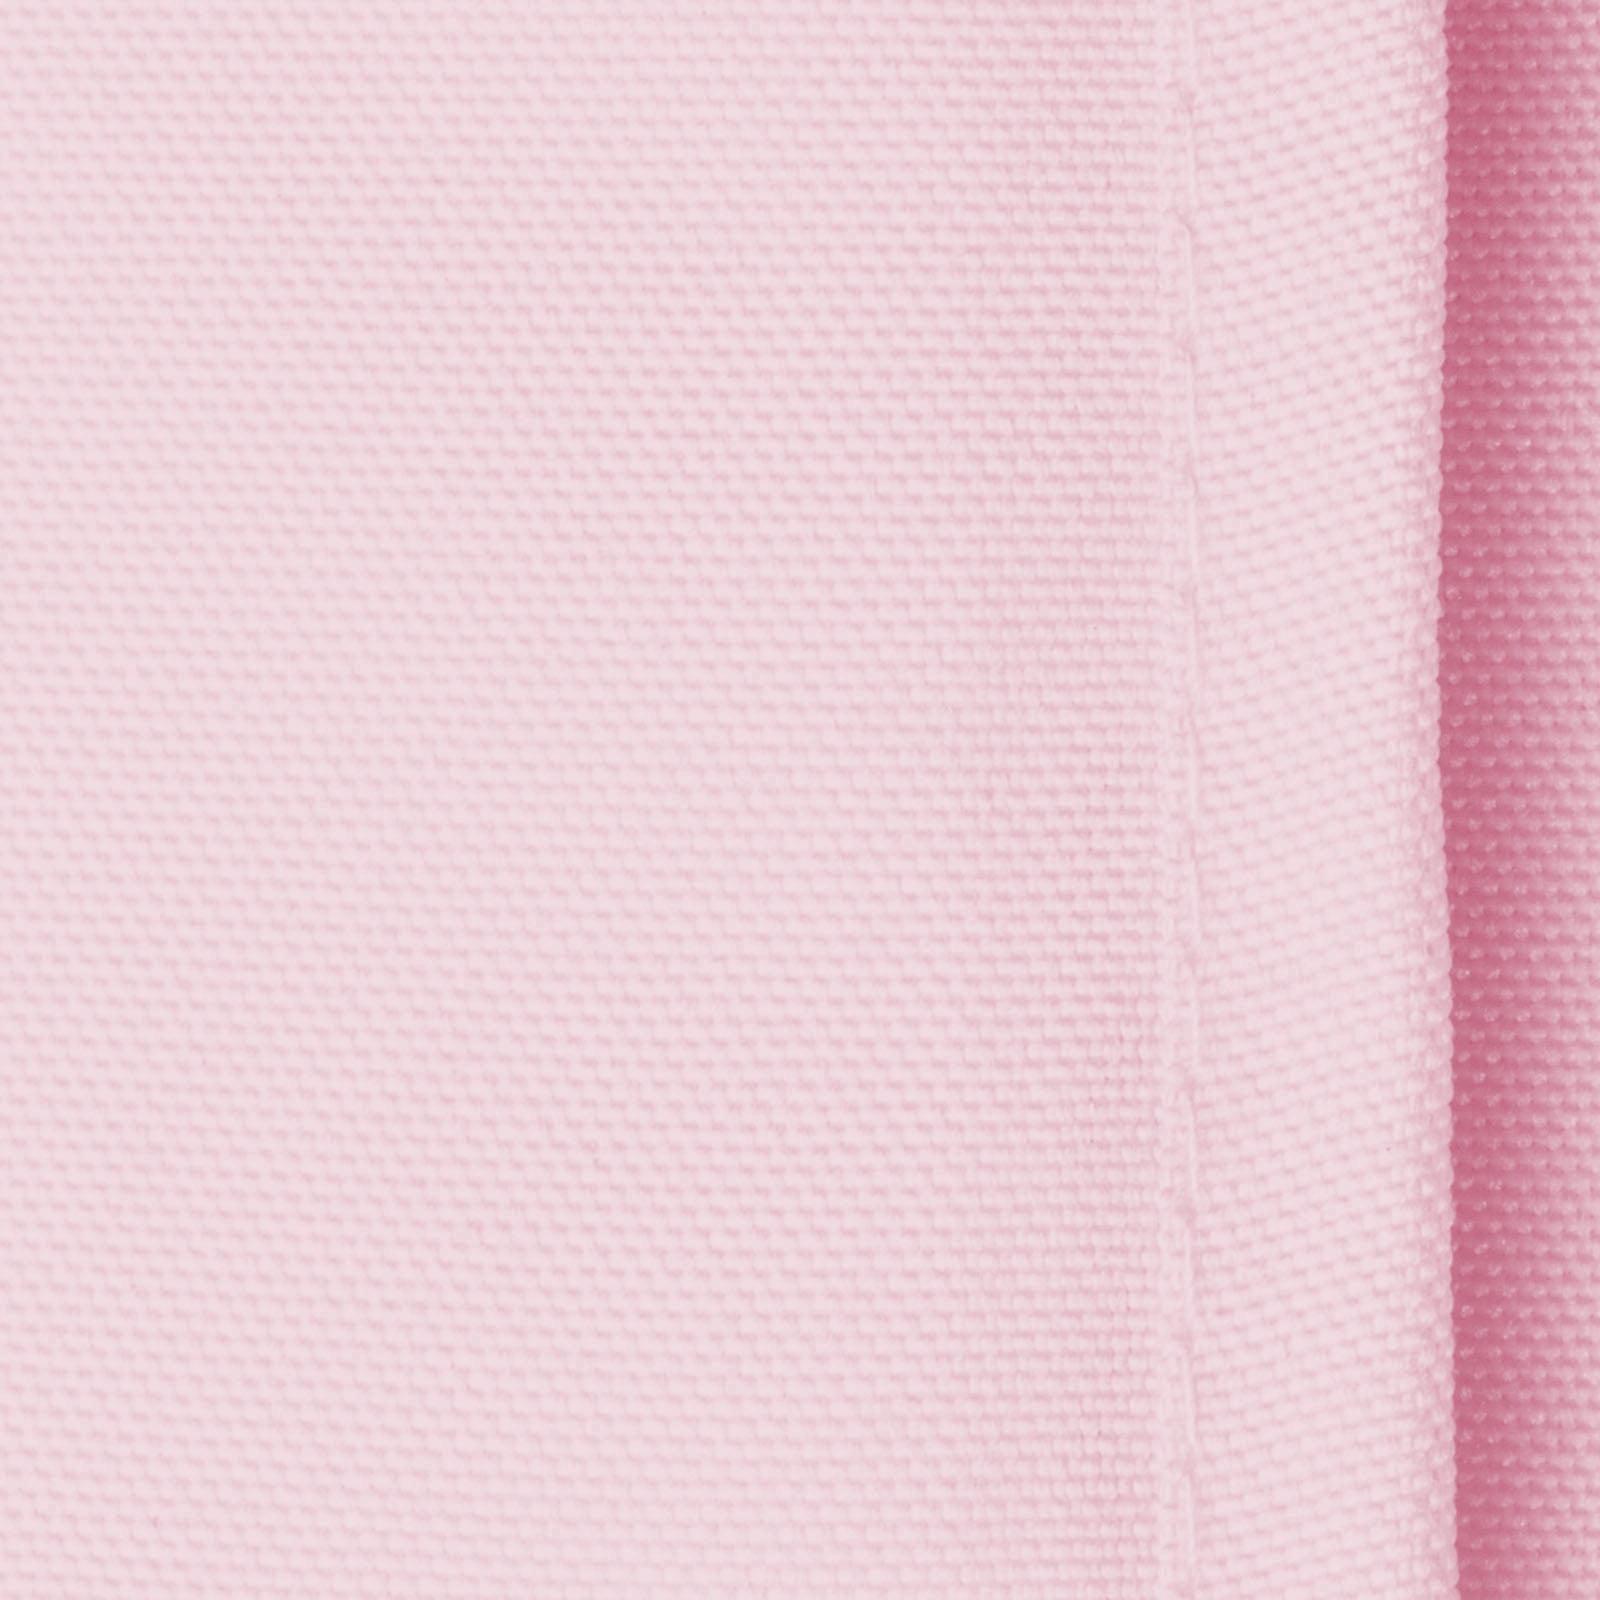 1 Dozen 20 Oversized Cloth Dinner Table Napkins Lanns Linens Royal Blue Machine Washable Restaurant//Wedding//Hotel Quality Polyester Fabric